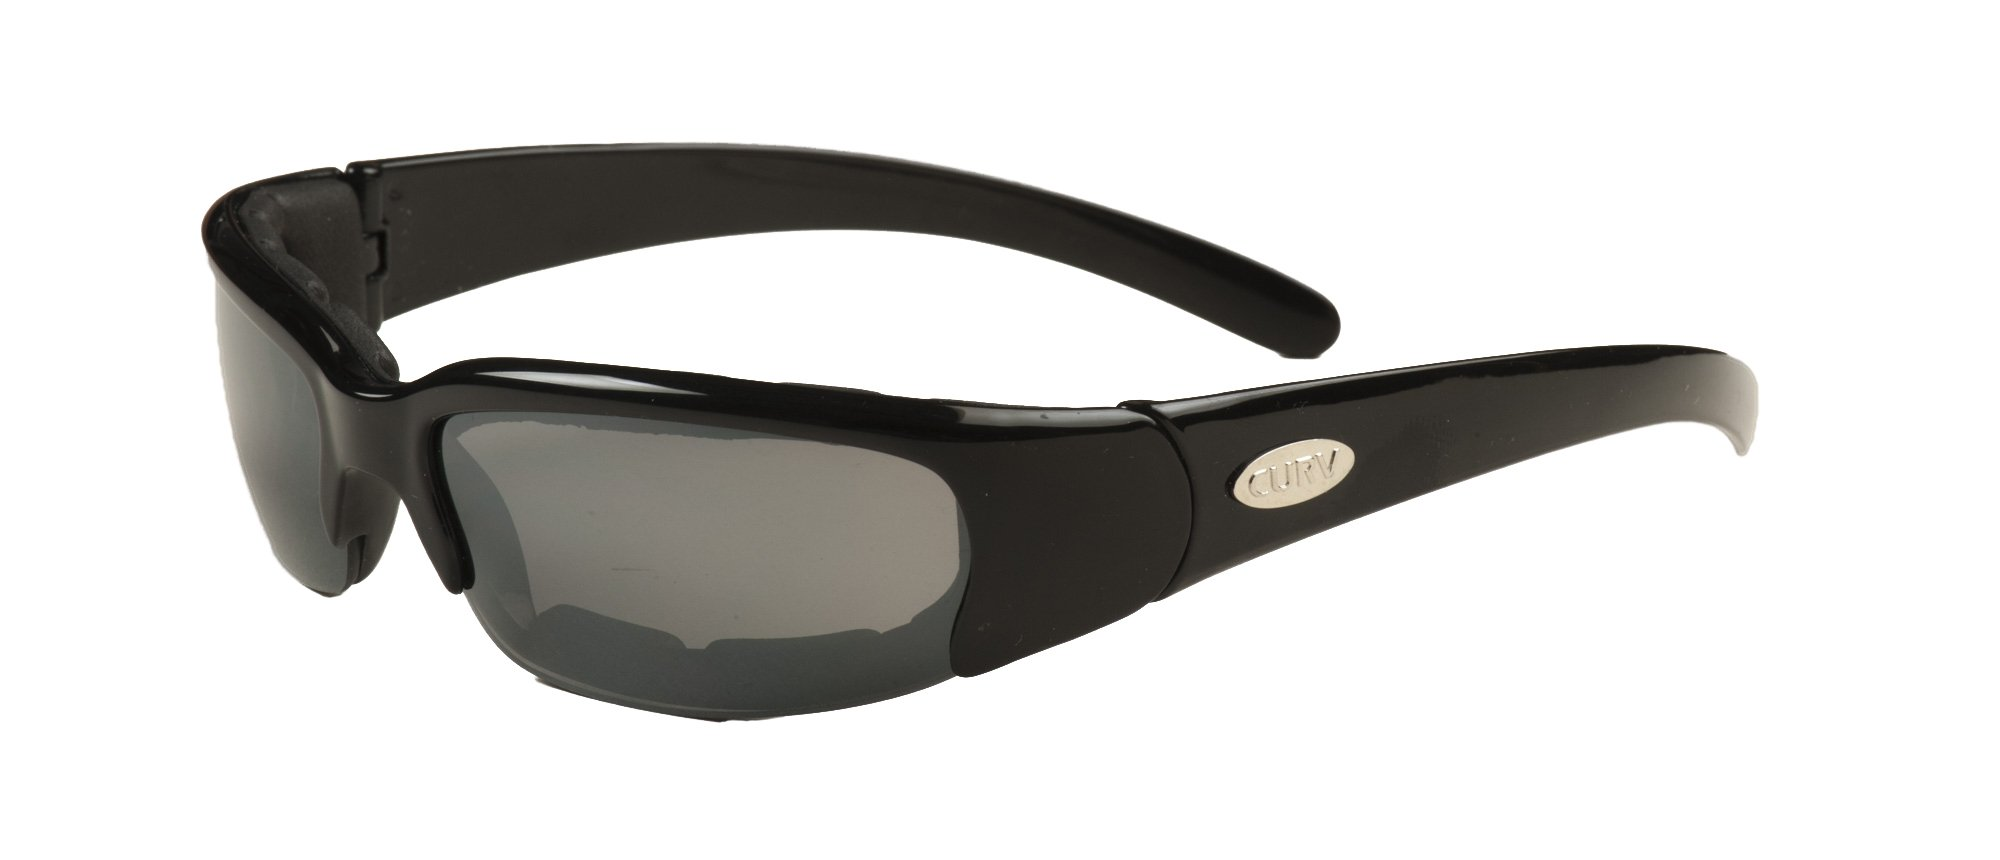 01-57M - Curv Matte Padded Sunglasses with Vented EVA Foam Padding